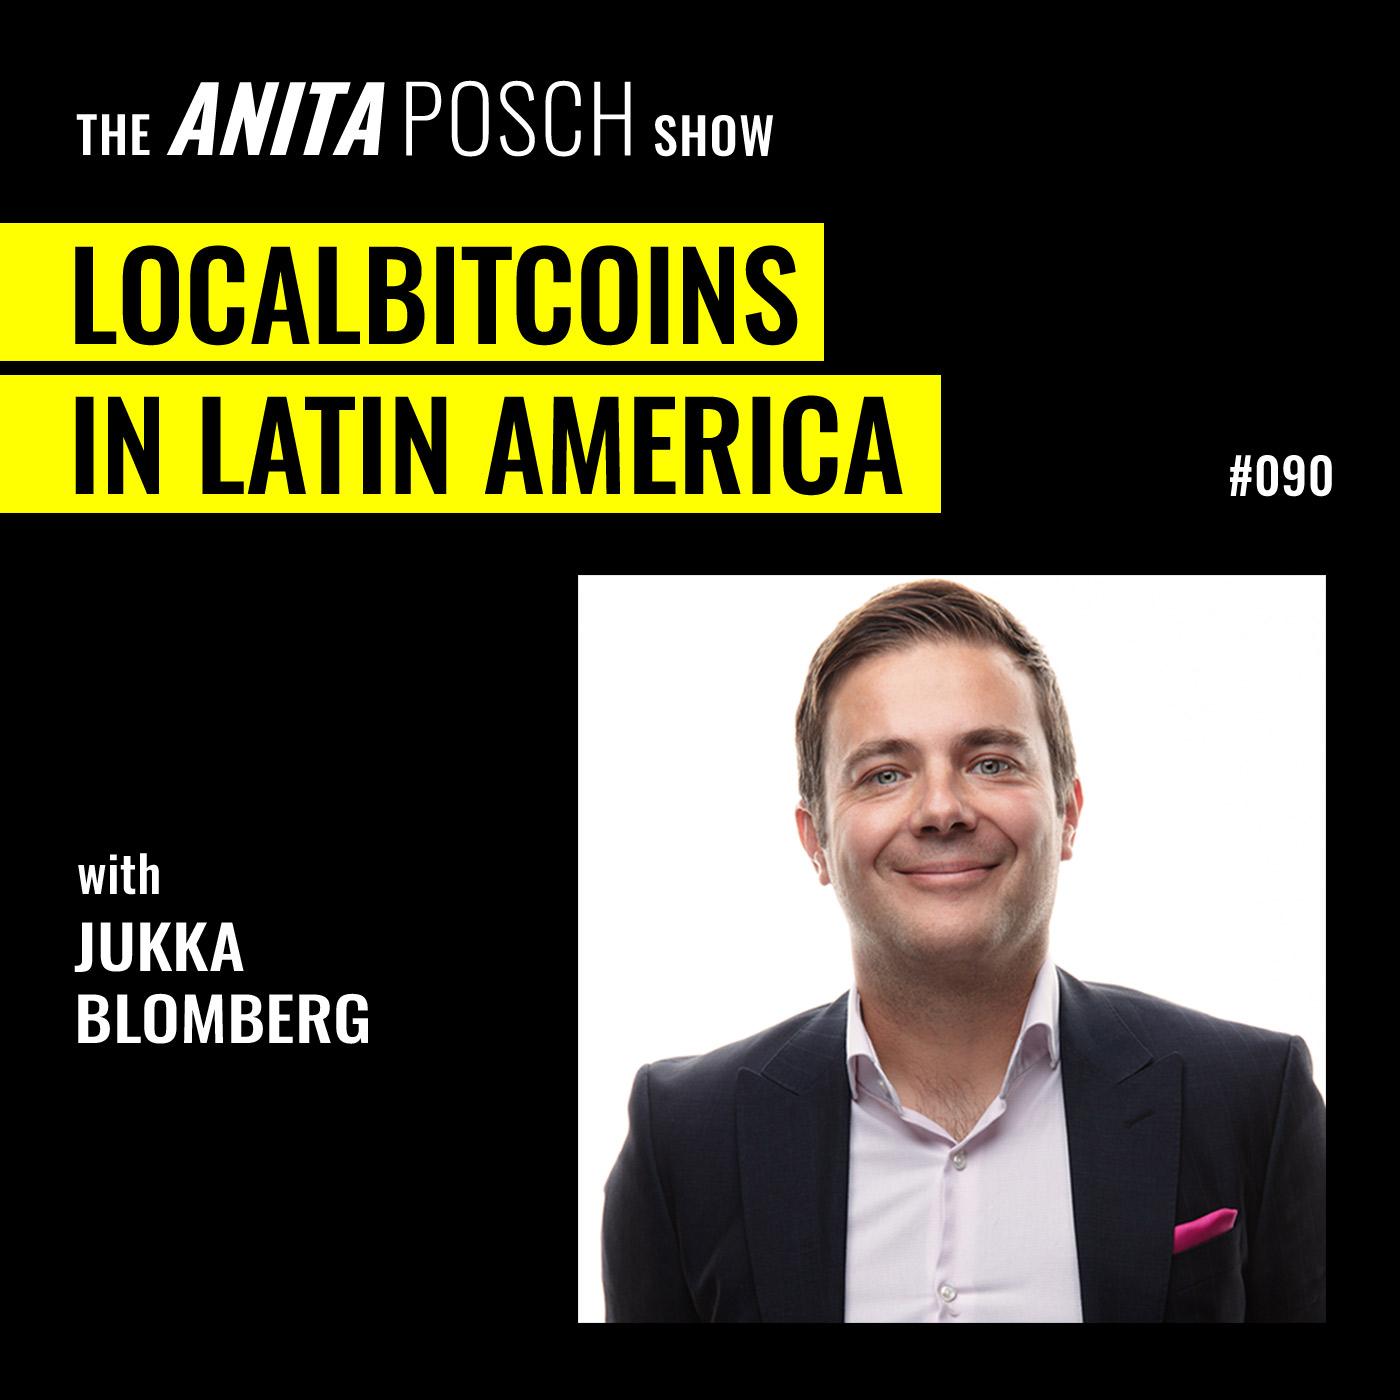 Jukka-Blomberg LocalBitcoins Podcast